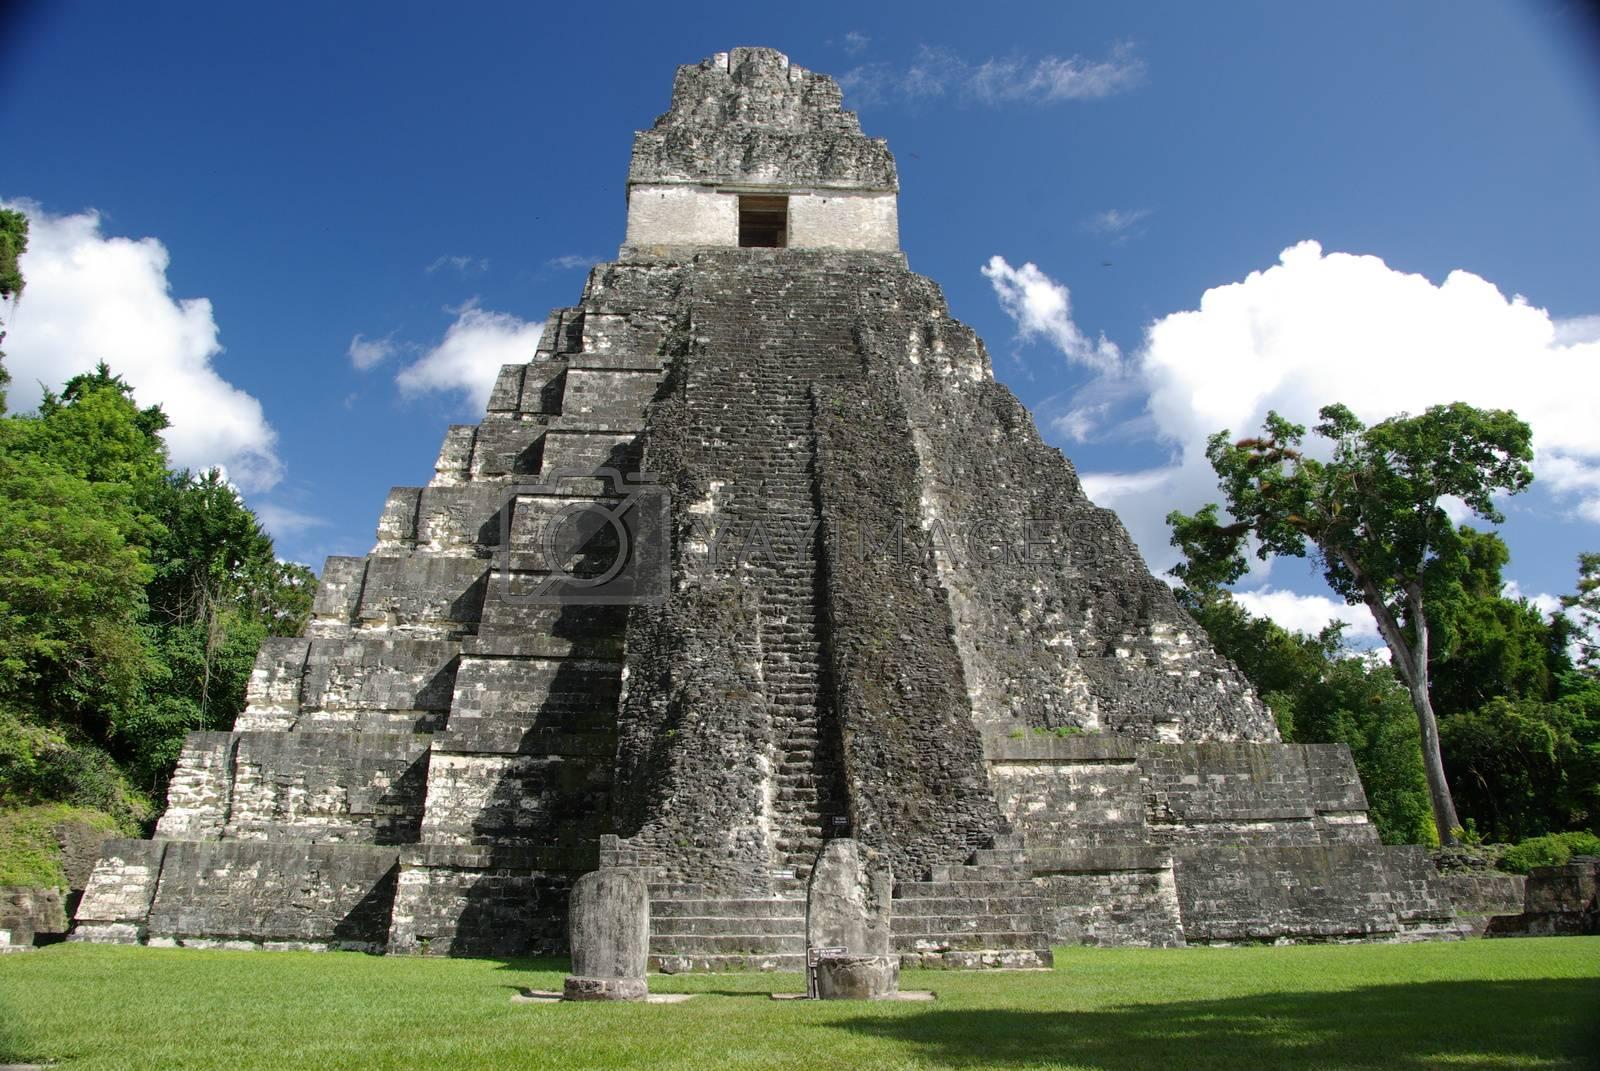 Royalty free image of Mayan ruins in Guatemala by pascalou95